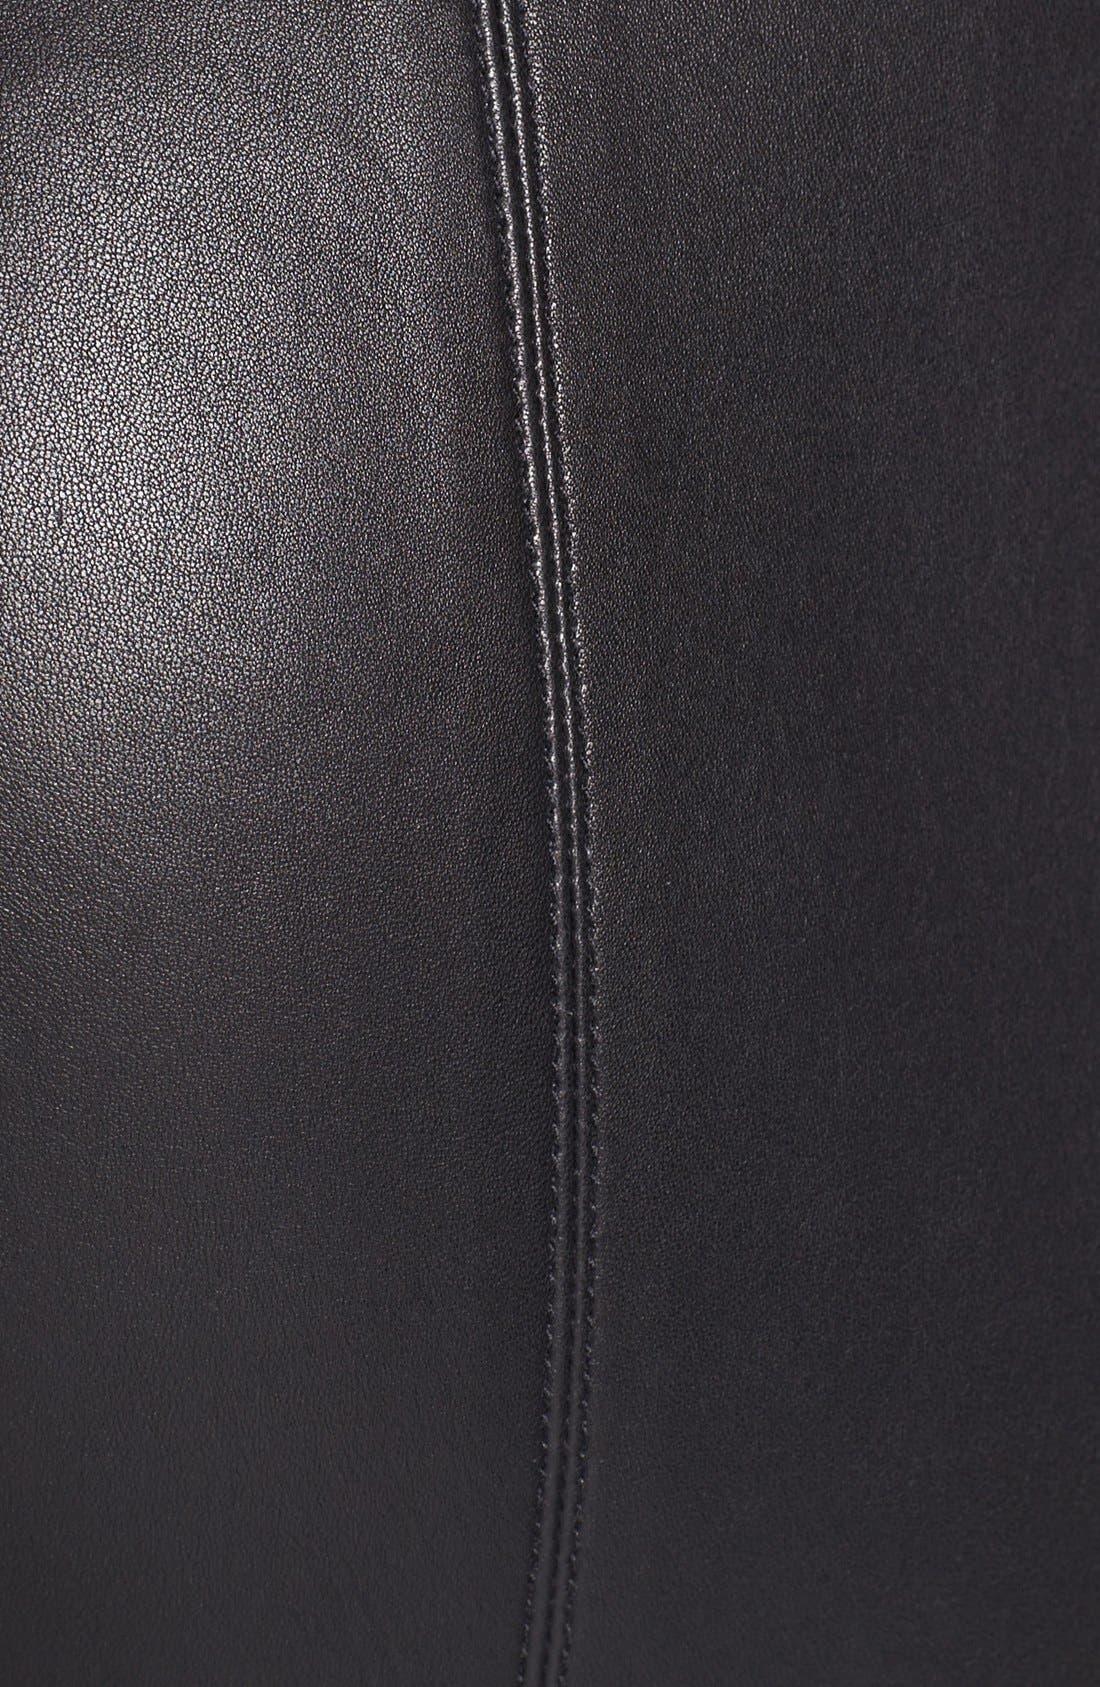 Alternate Image 3  - Miss Wu Leather Leggings (Nordstrom Exclusive)